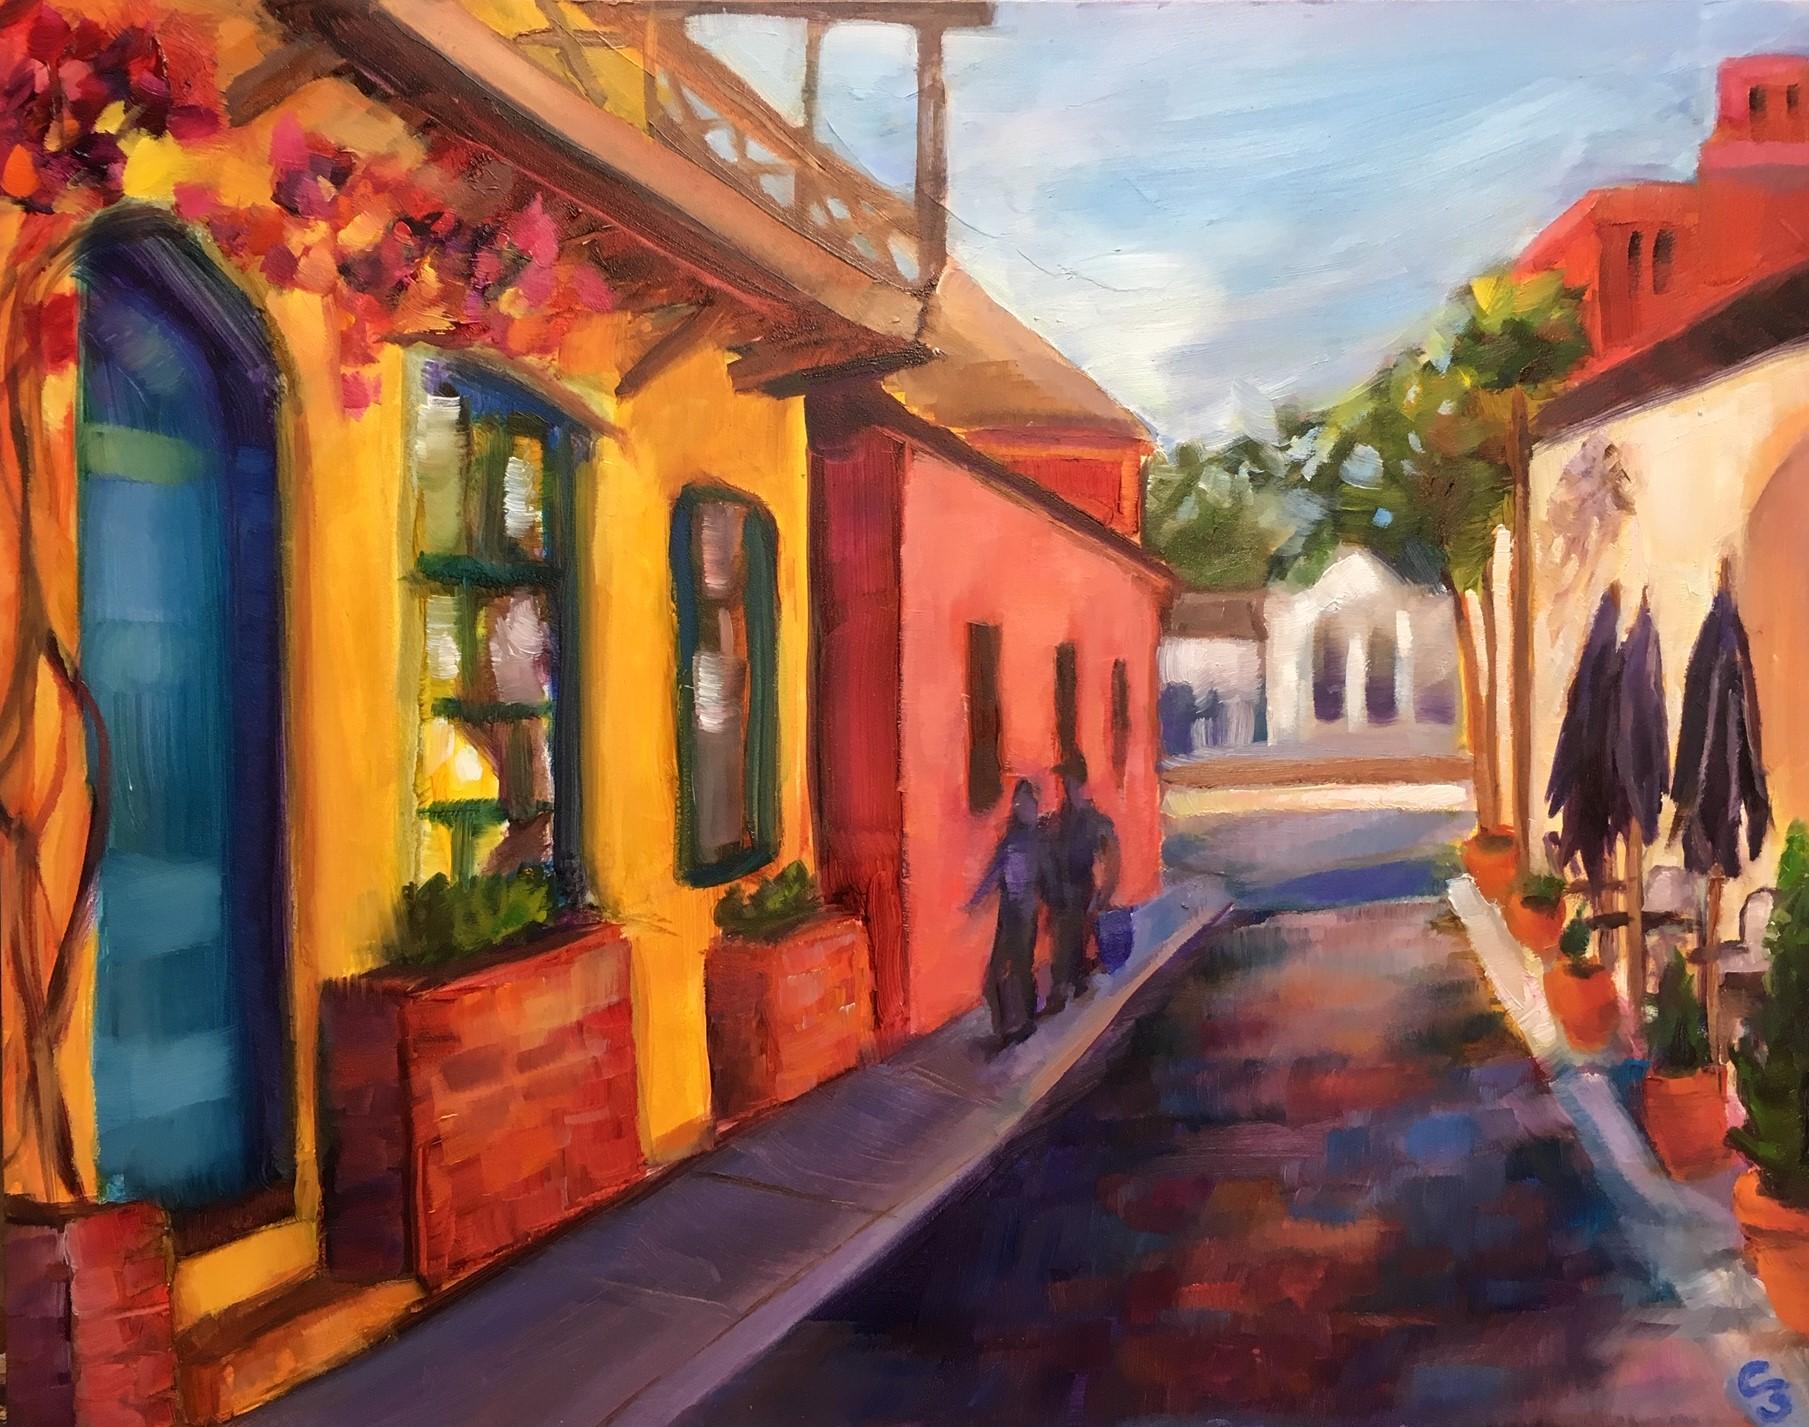 'Calle de Colores'